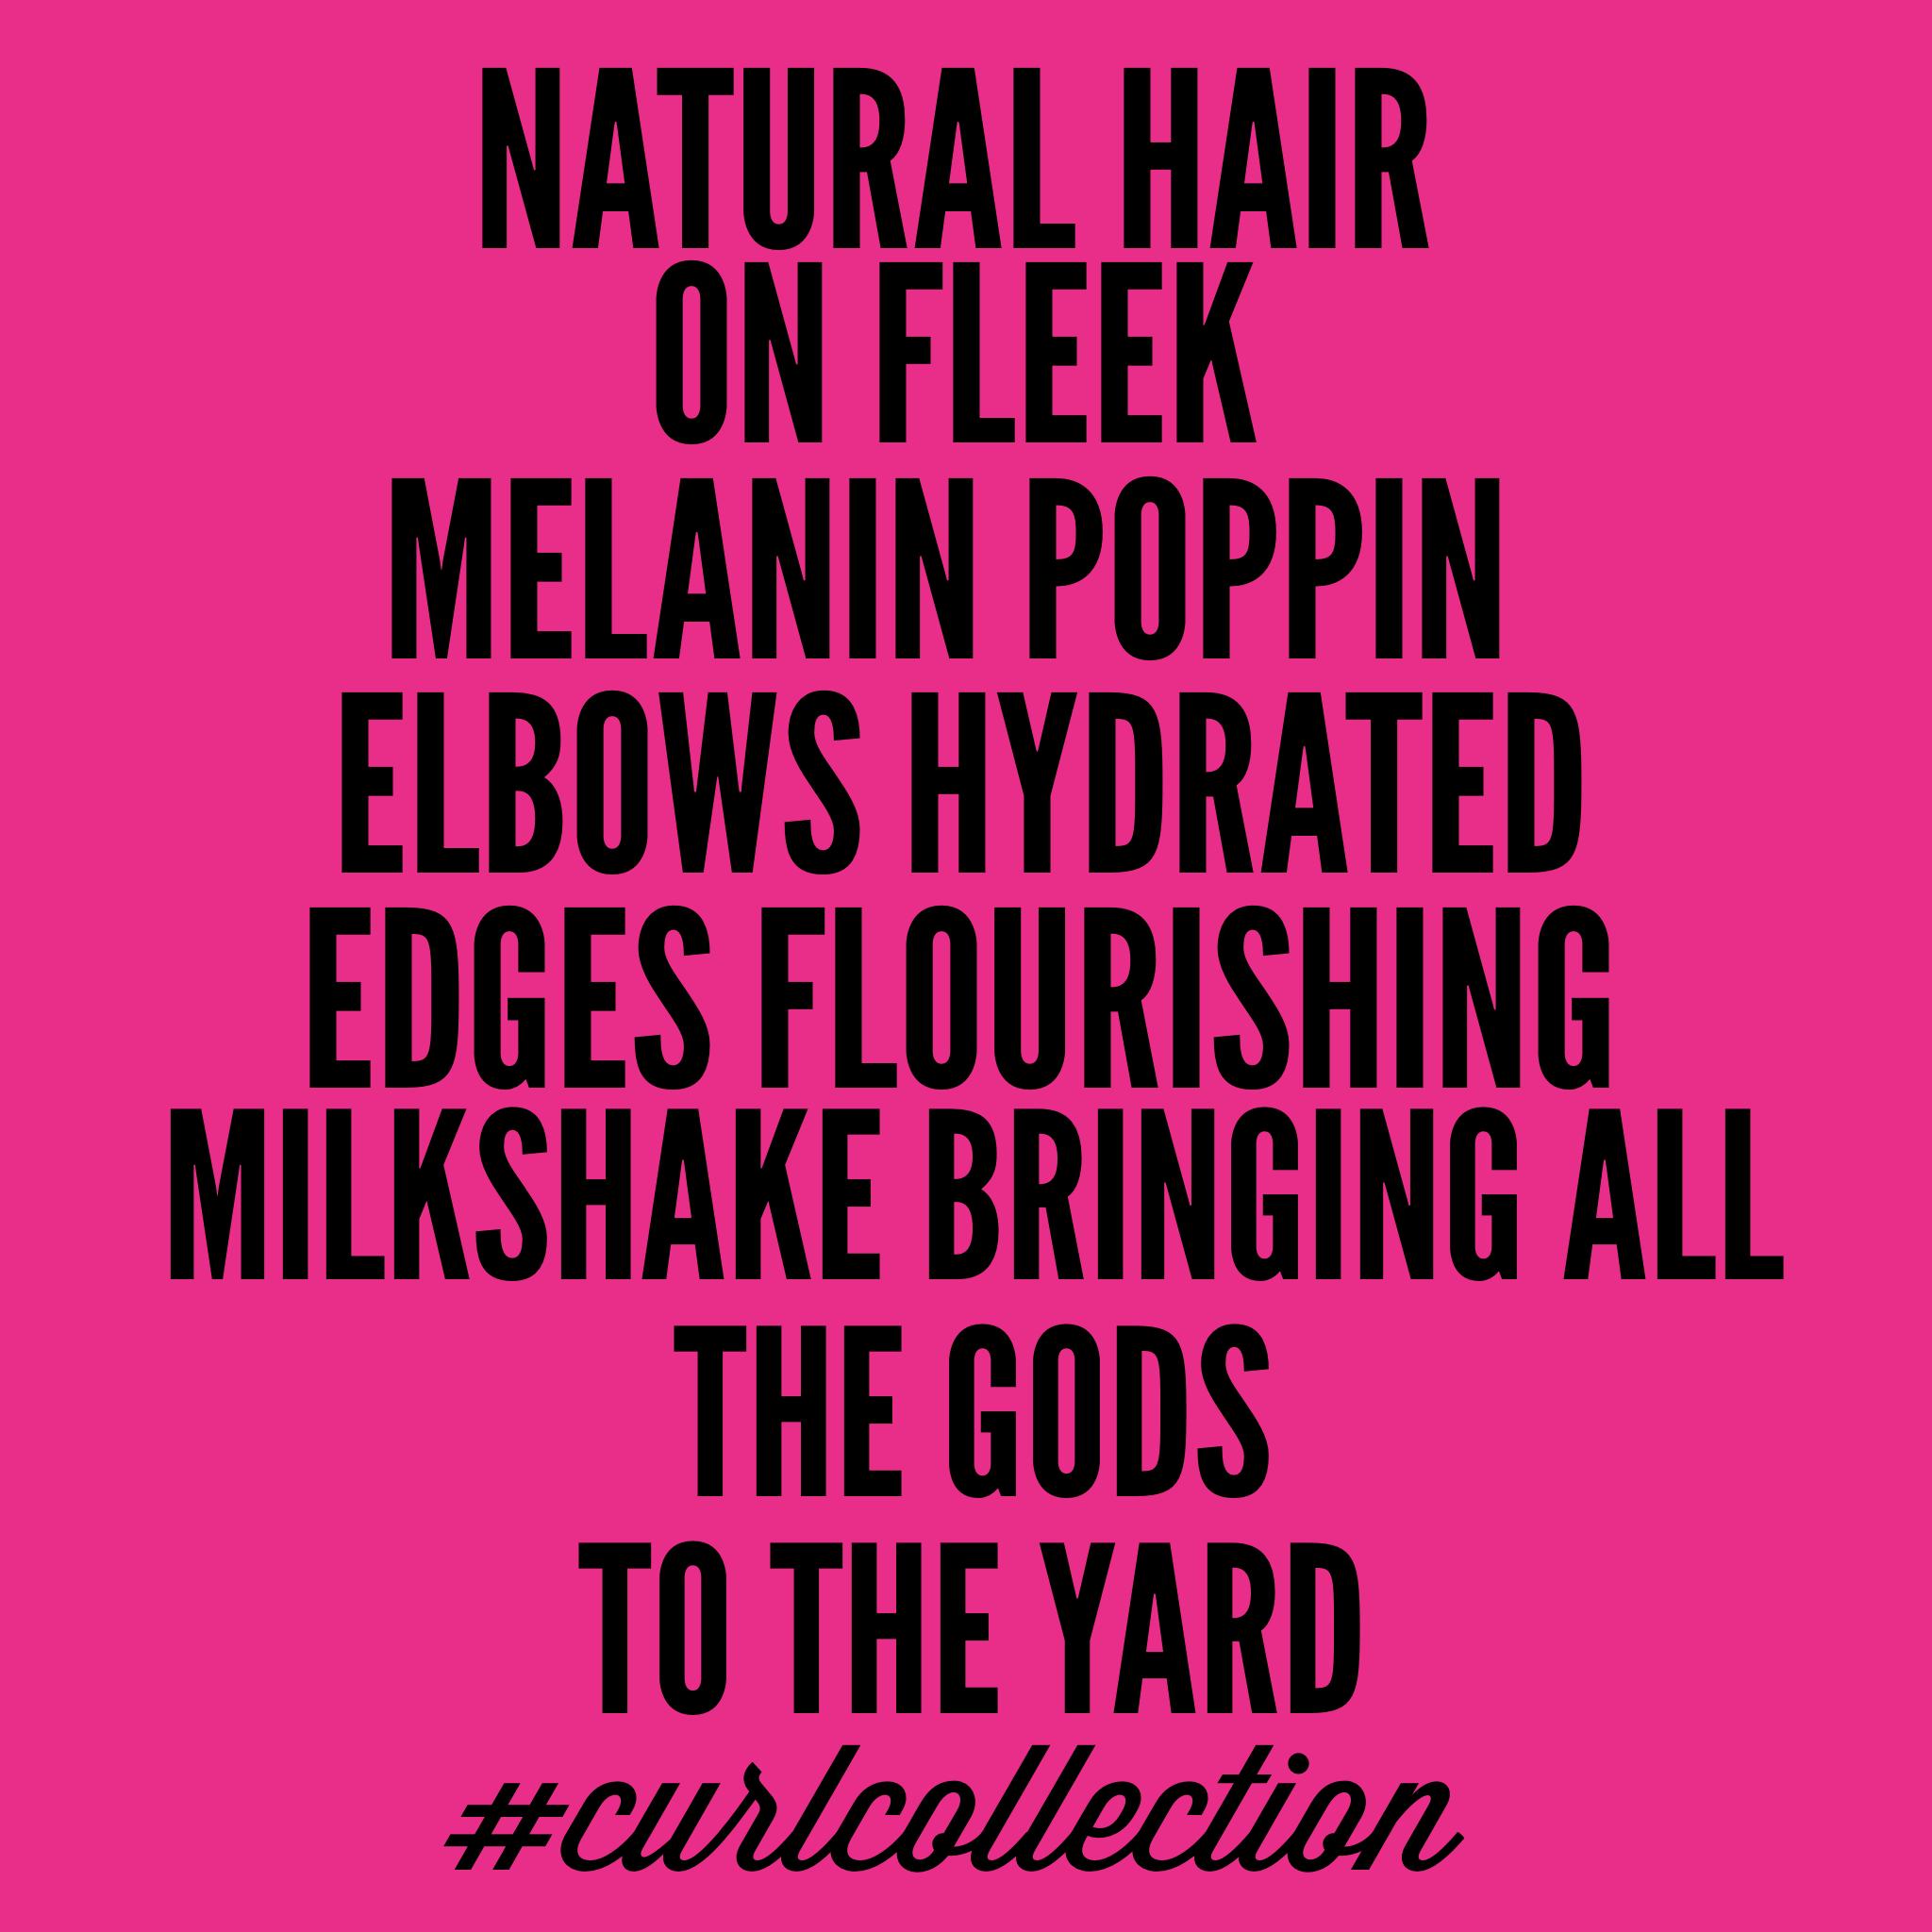 Natural Hair On Fleek Melanin Poppin Elbows Hydrated Edges Flourishing Milkshake Bringing All T Natural Hair Quotes Natural Hair Styles Natural Hair Memes